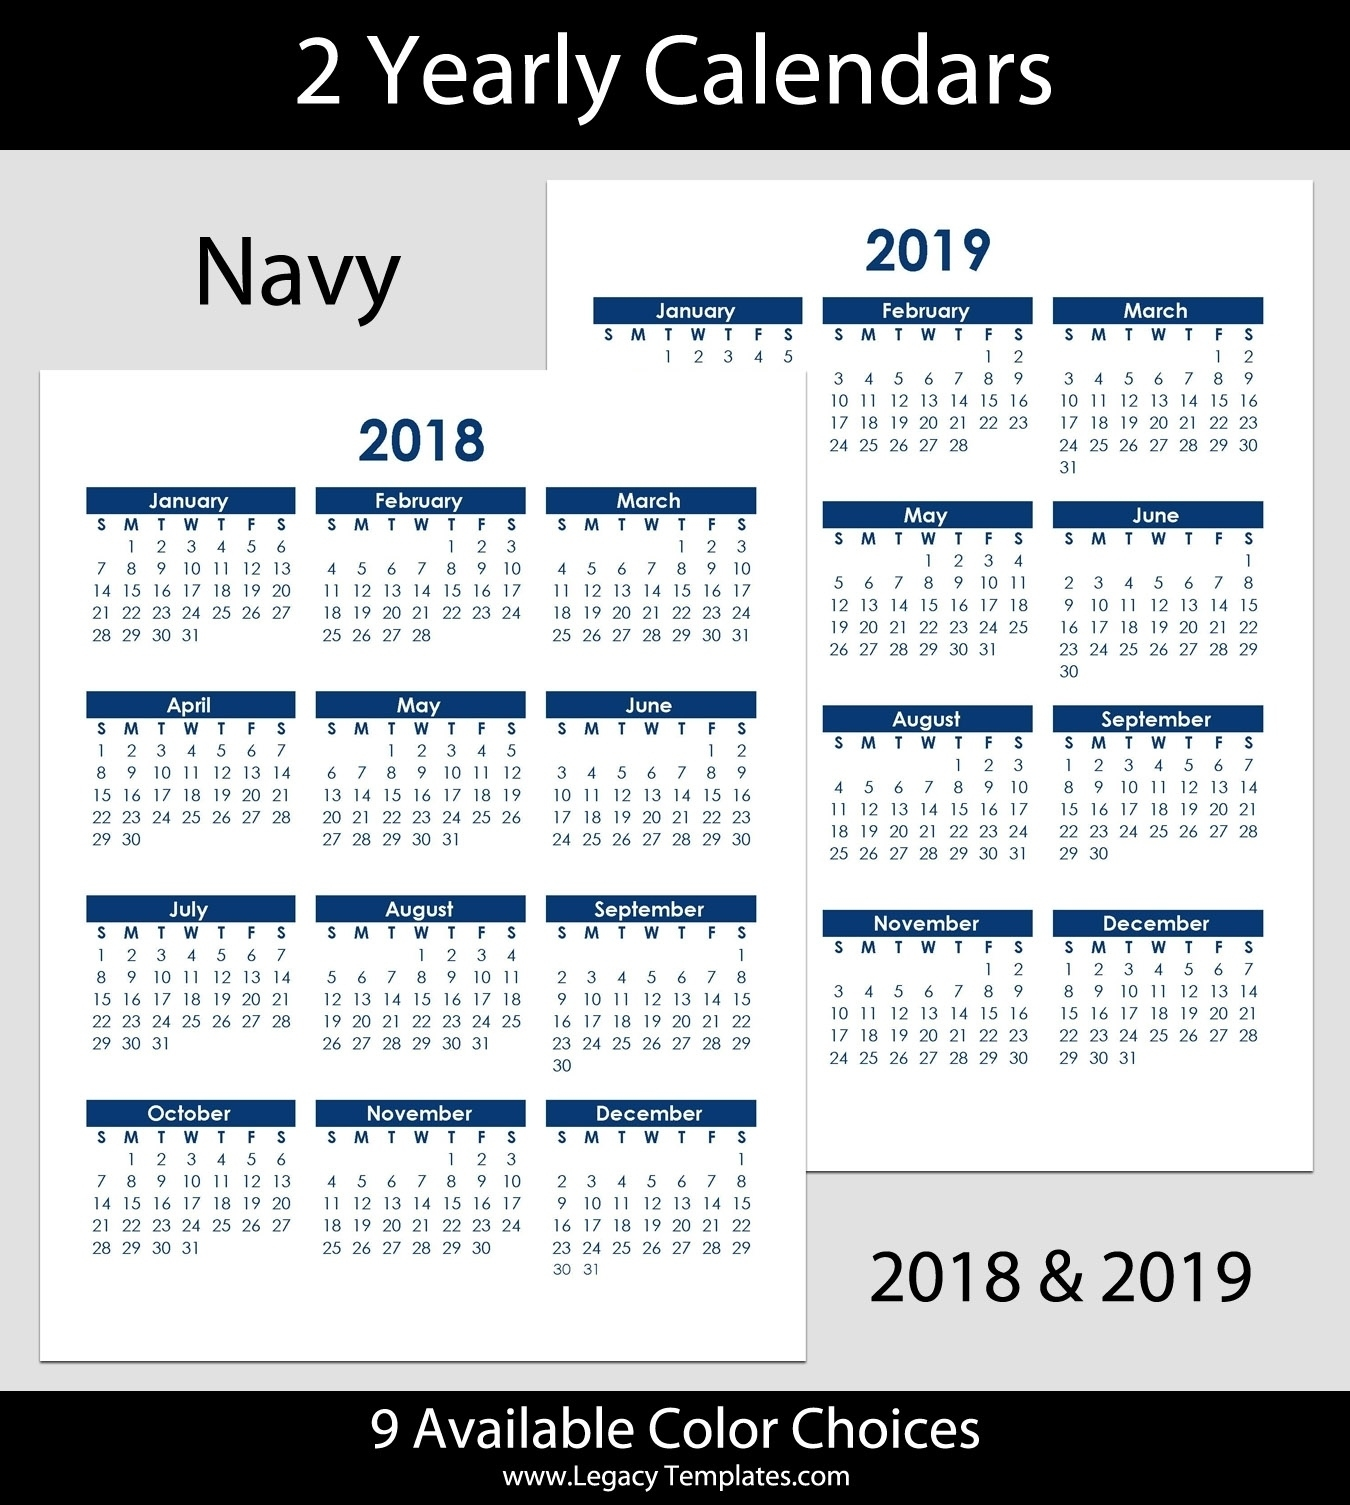 8.5 X 11 Year Calendar | Ten Free Printable Calendar 2019-2020 8.5 X 14 Calendar Template